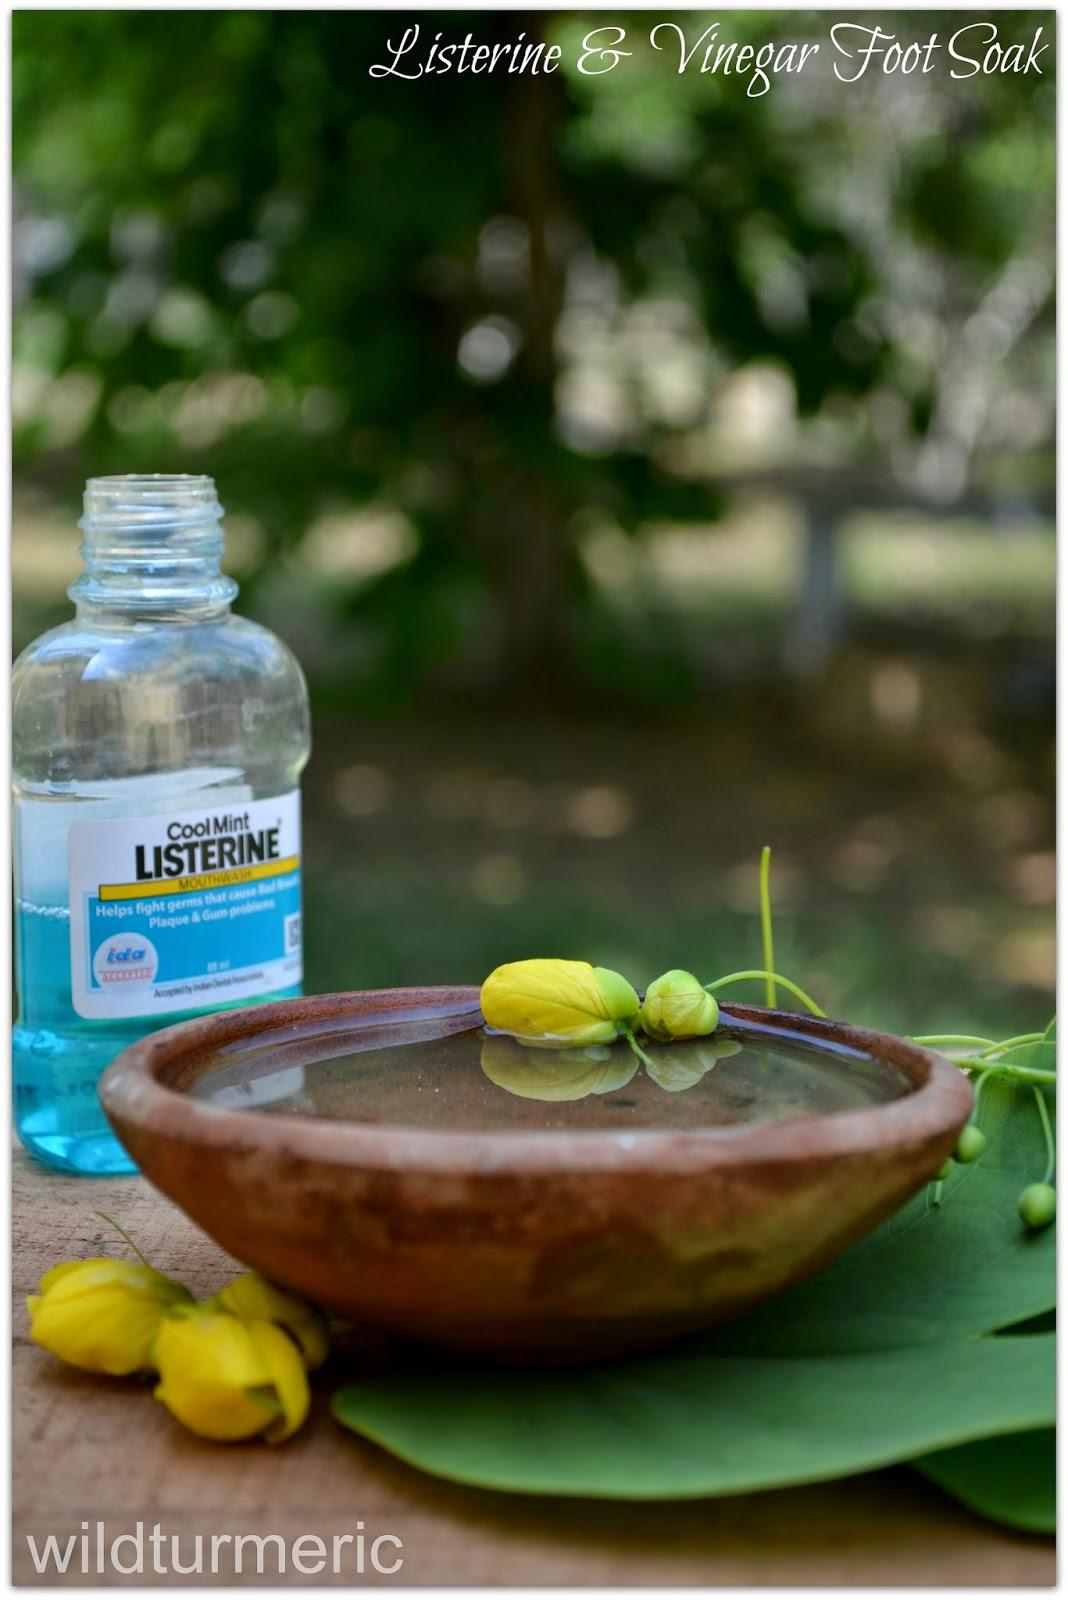 Listerine and Vinegar Treatment for Feet